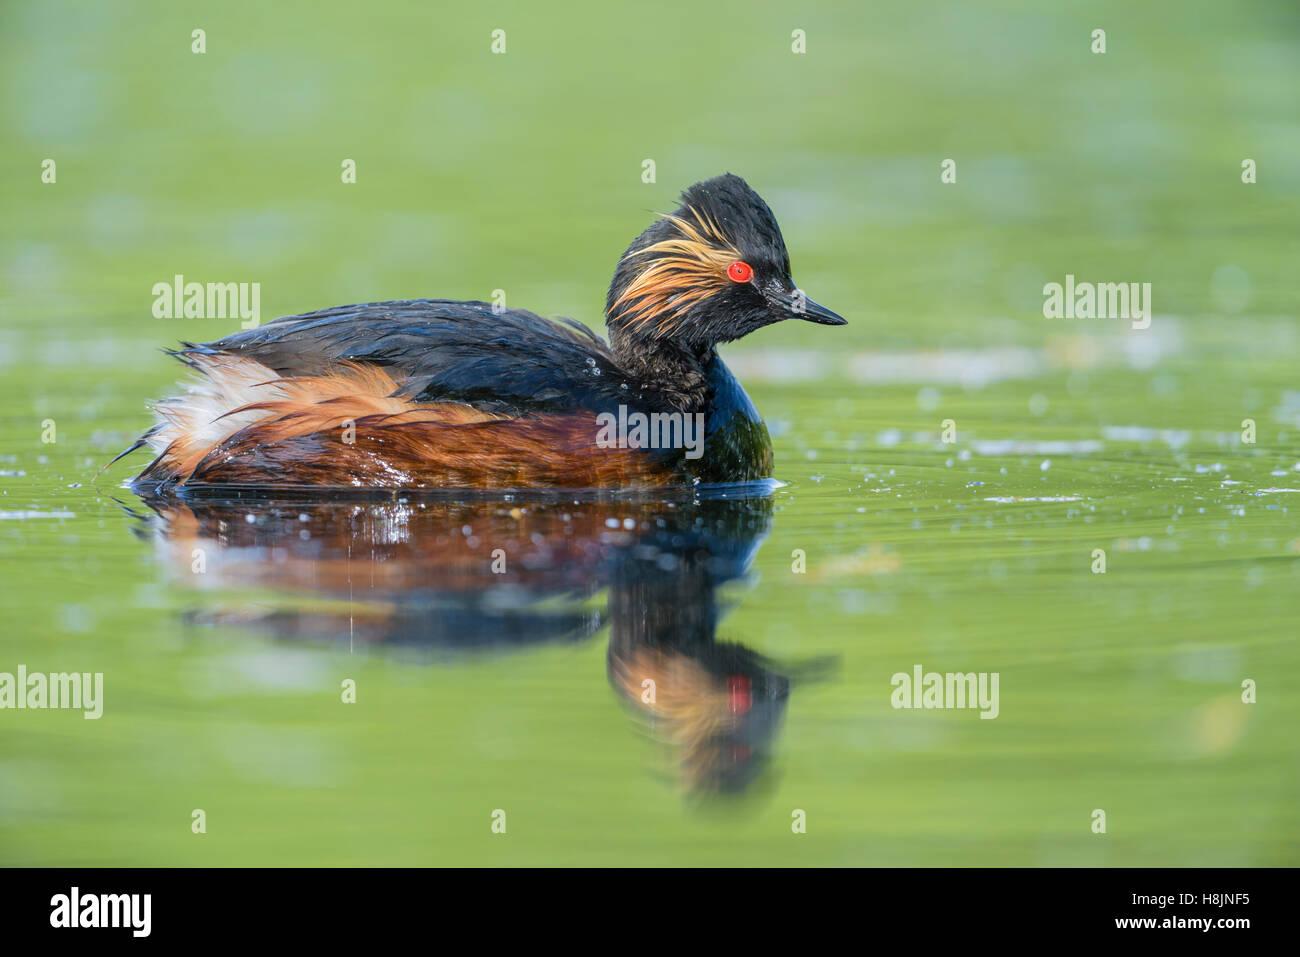 Schwarzhalstaucher, Podiceps nigricollis, Black necked Grebe - Stock Image